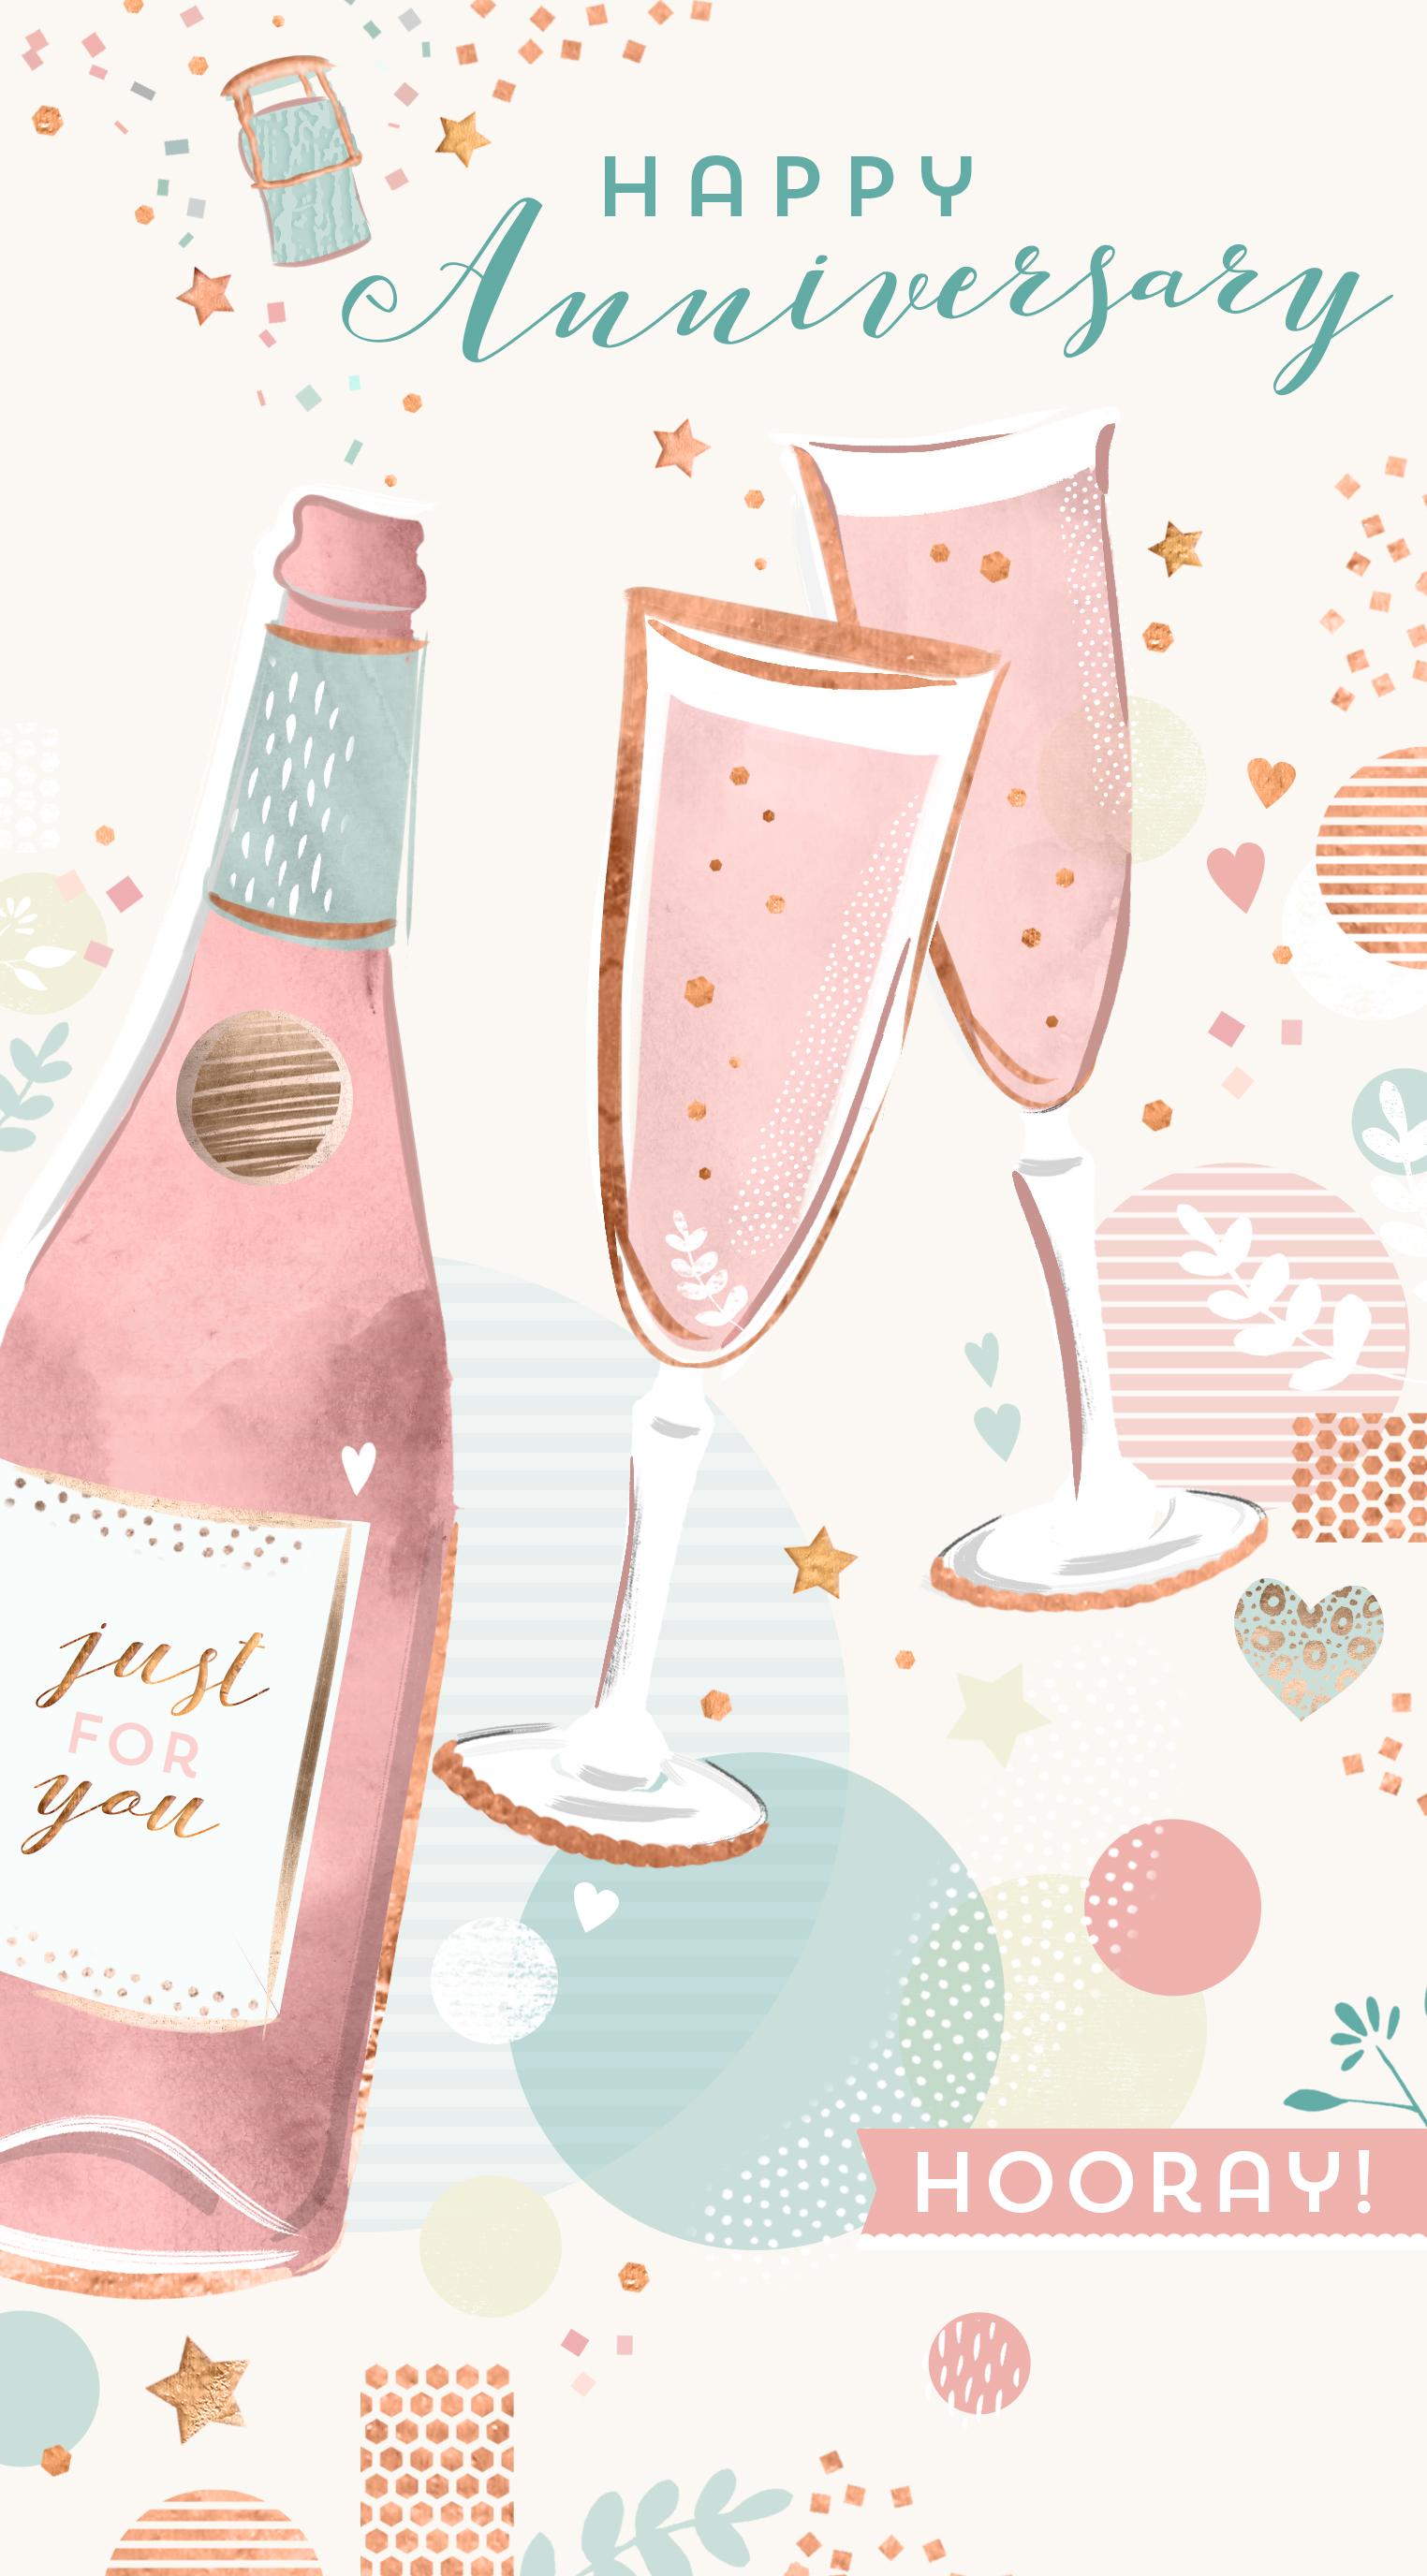 Anniversary card design by Martha Bowyer